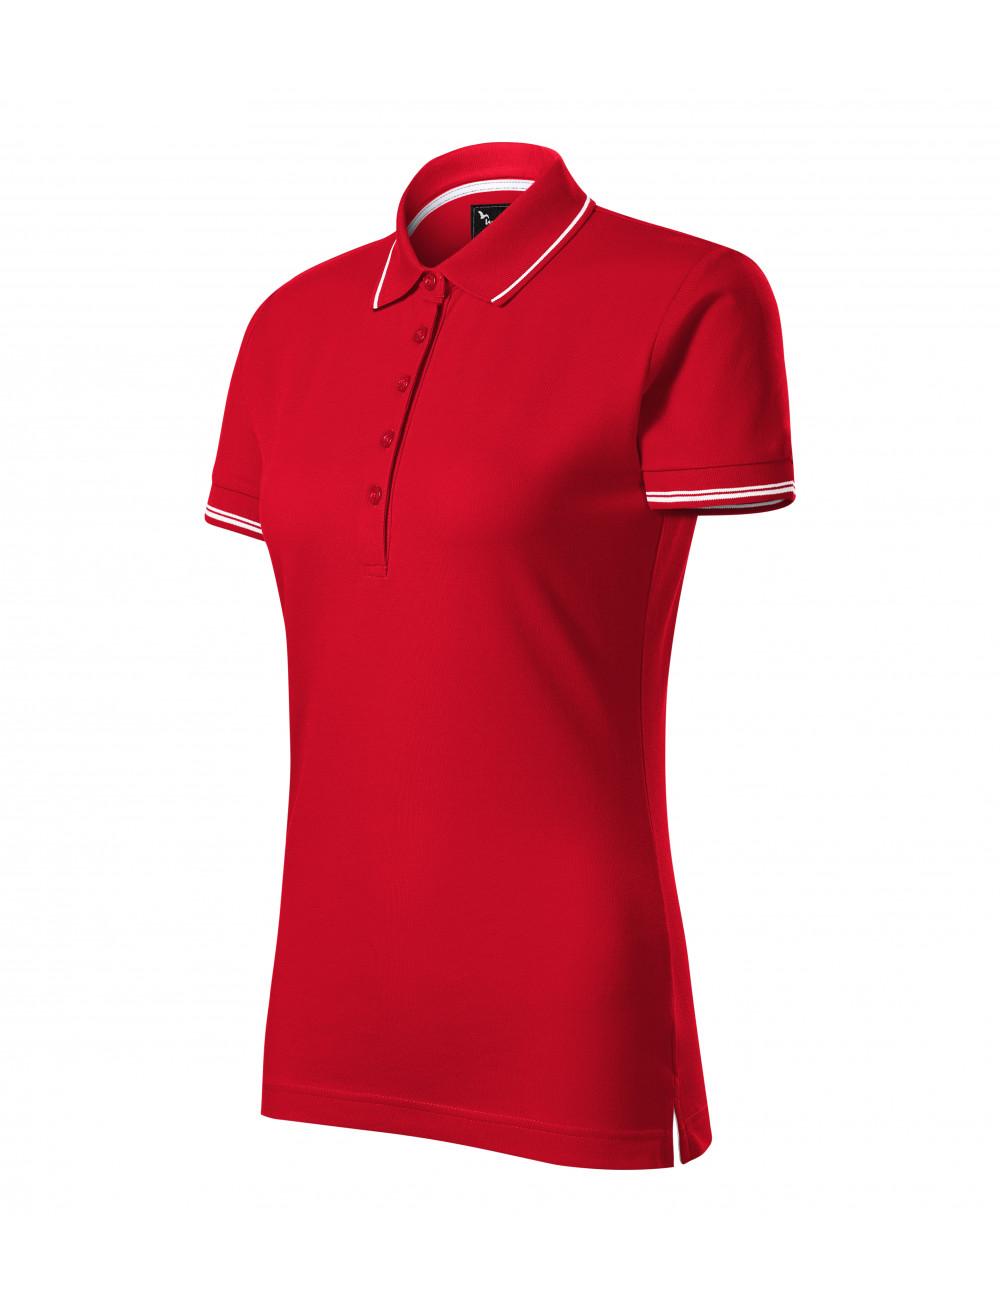 Adler MALFINIPREMIUM Koszulka polo damska Perfection plain 253 formula red